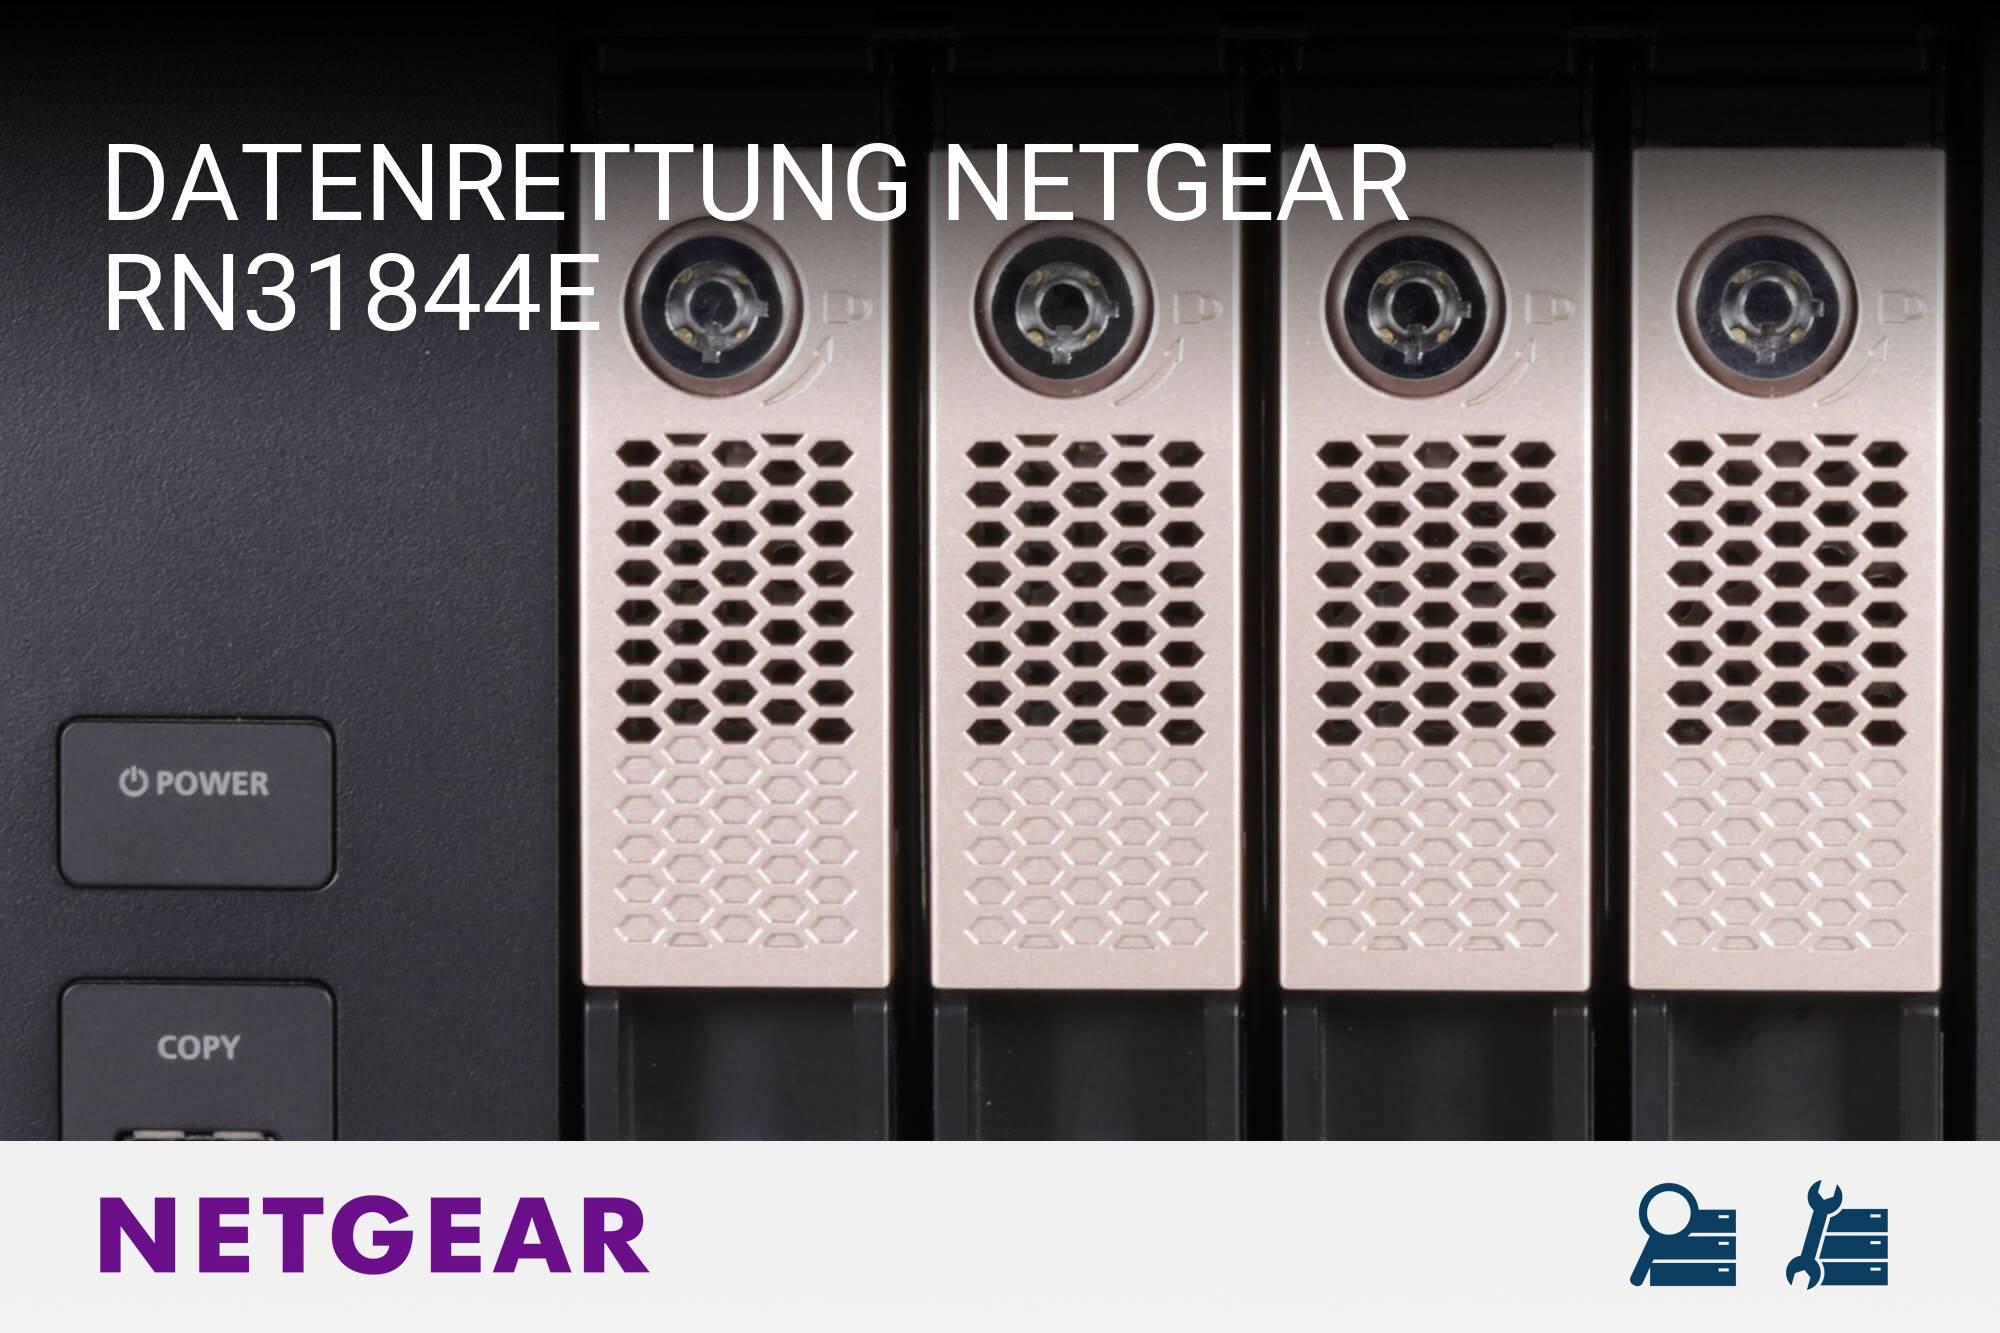 Netgear RN31844E